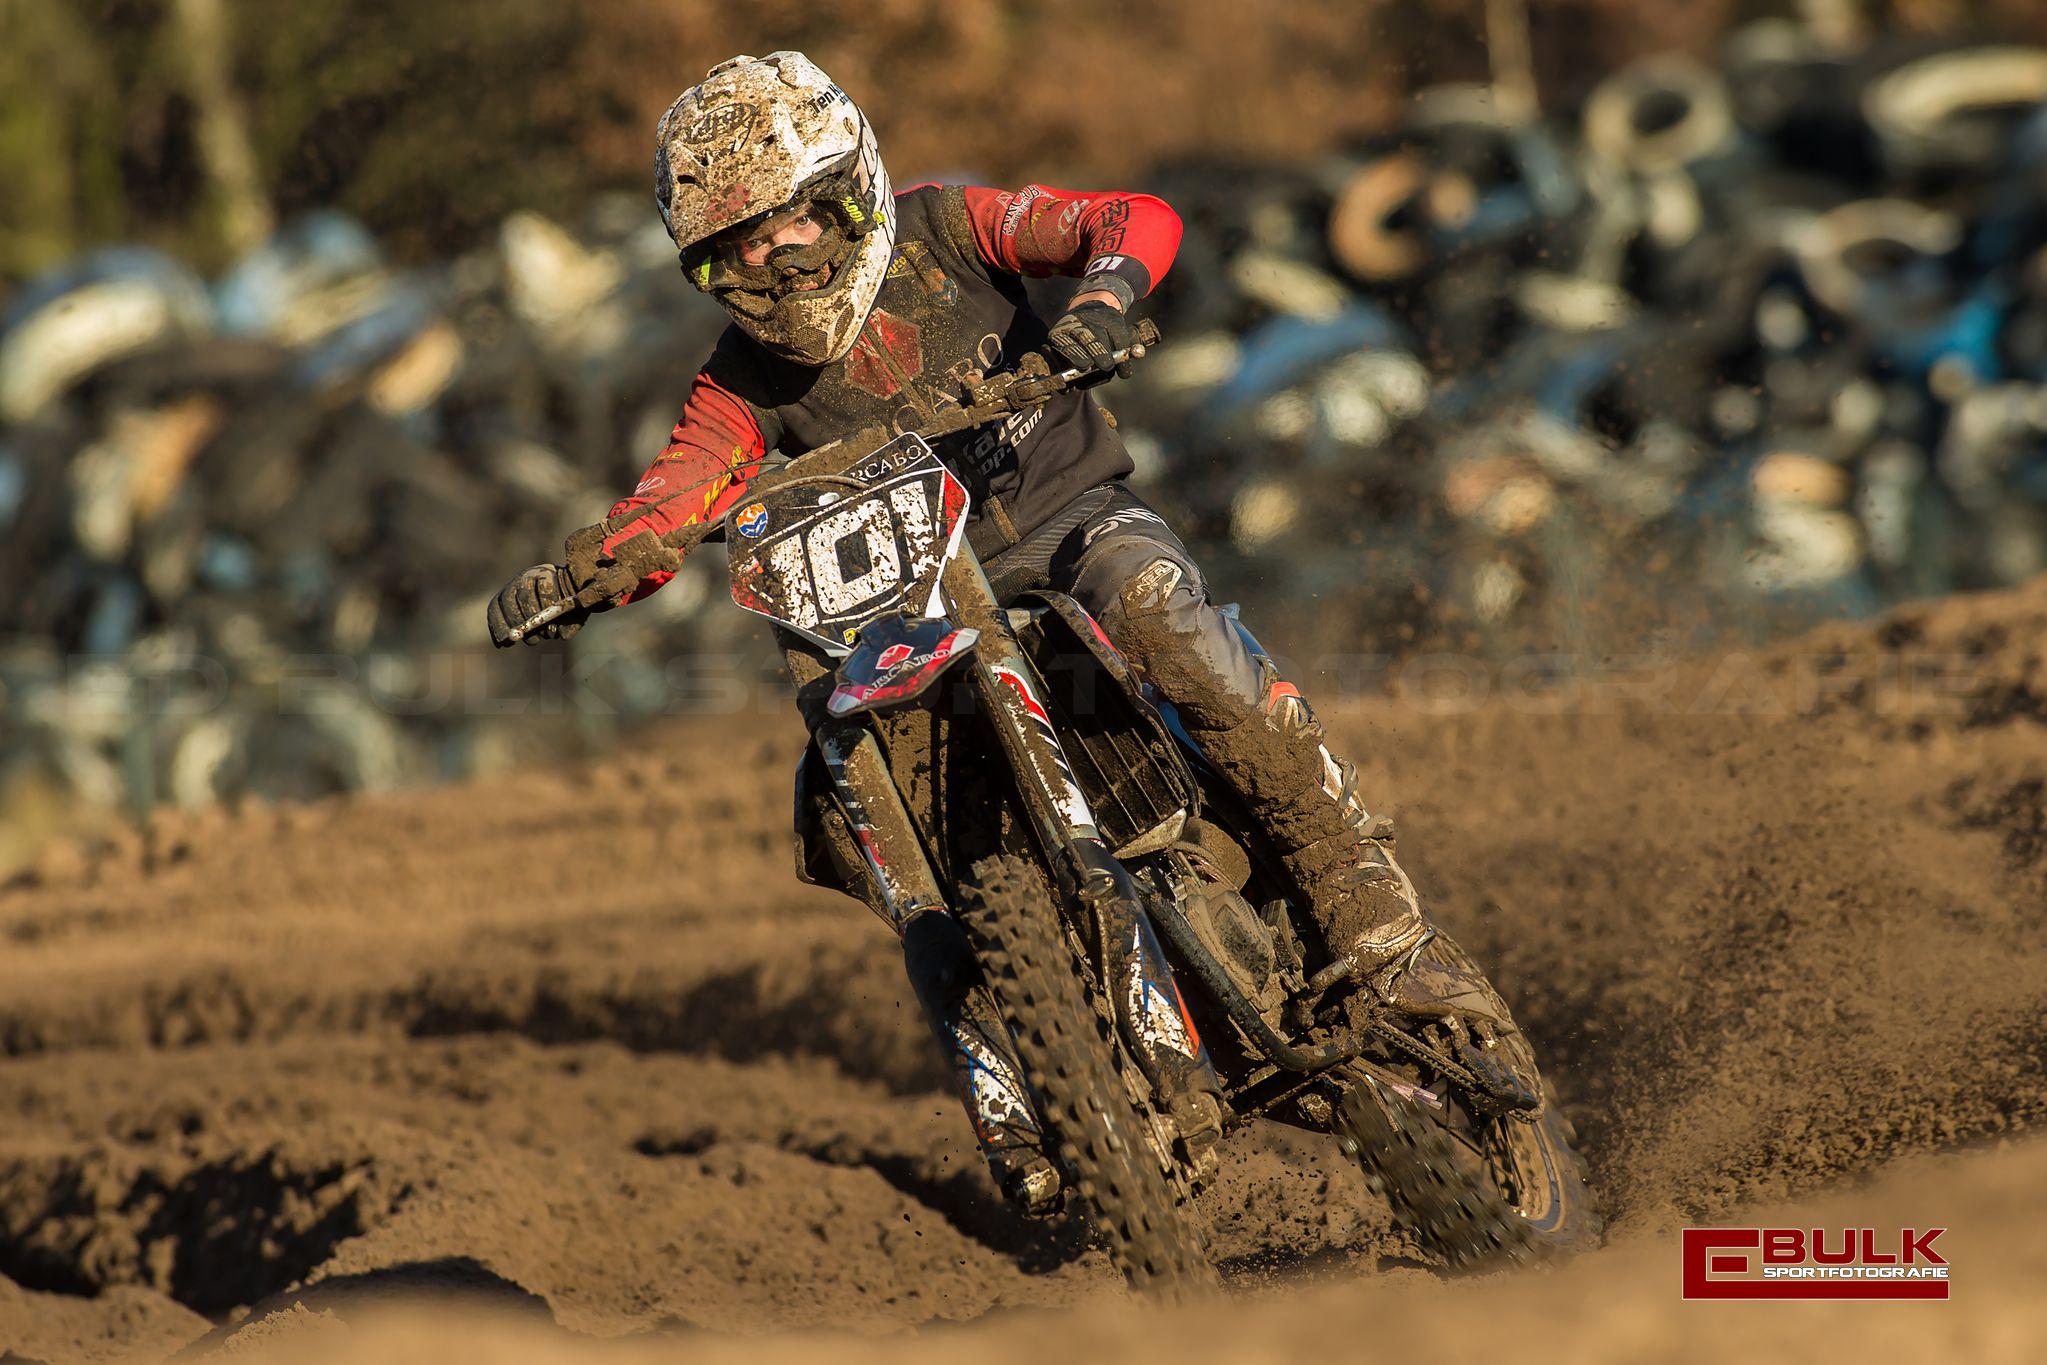 eebs1386-ed_bulk_sportfotografie